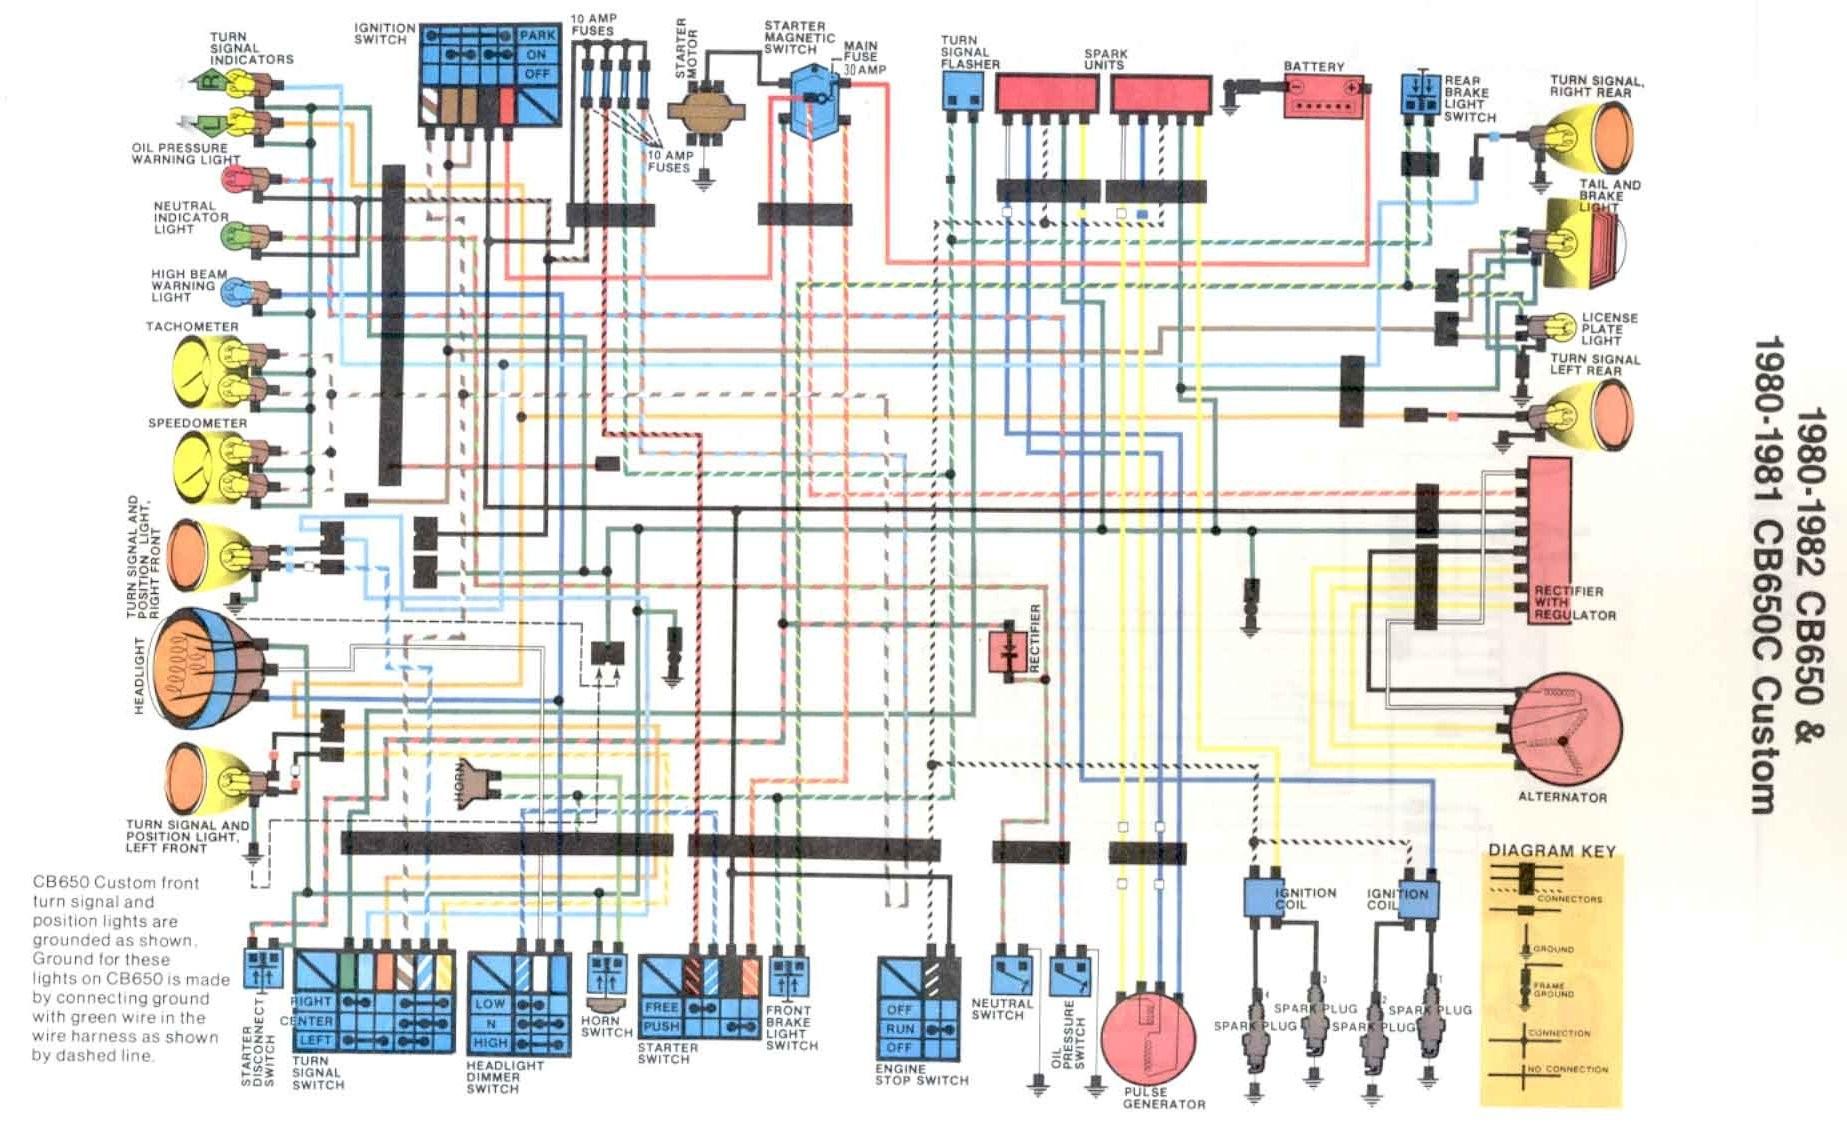 Wiring Diagram For 1980 Honda Express : Scintillating honda express wiring diagram pictures